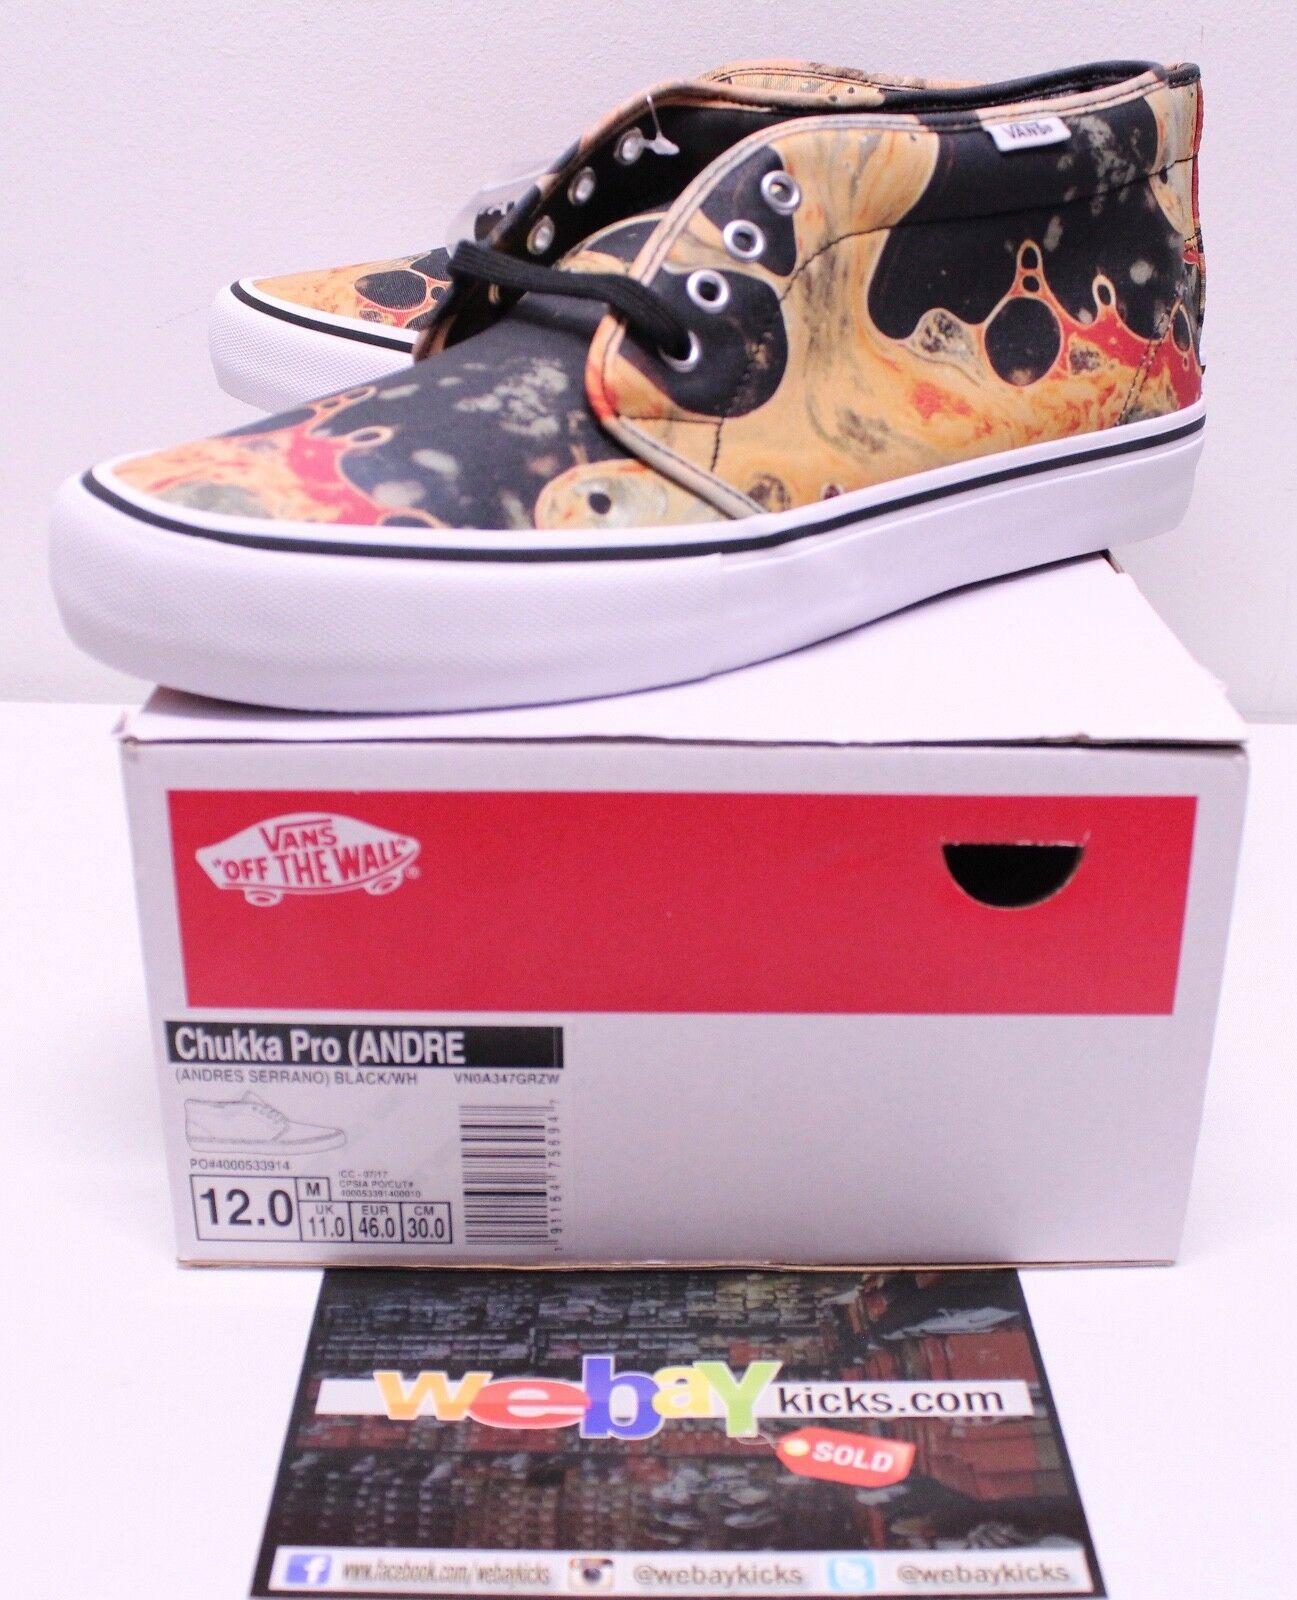 Vans Supreme Chukka Pro Mid Blood and Semen Sneakers Men's Size 12 New